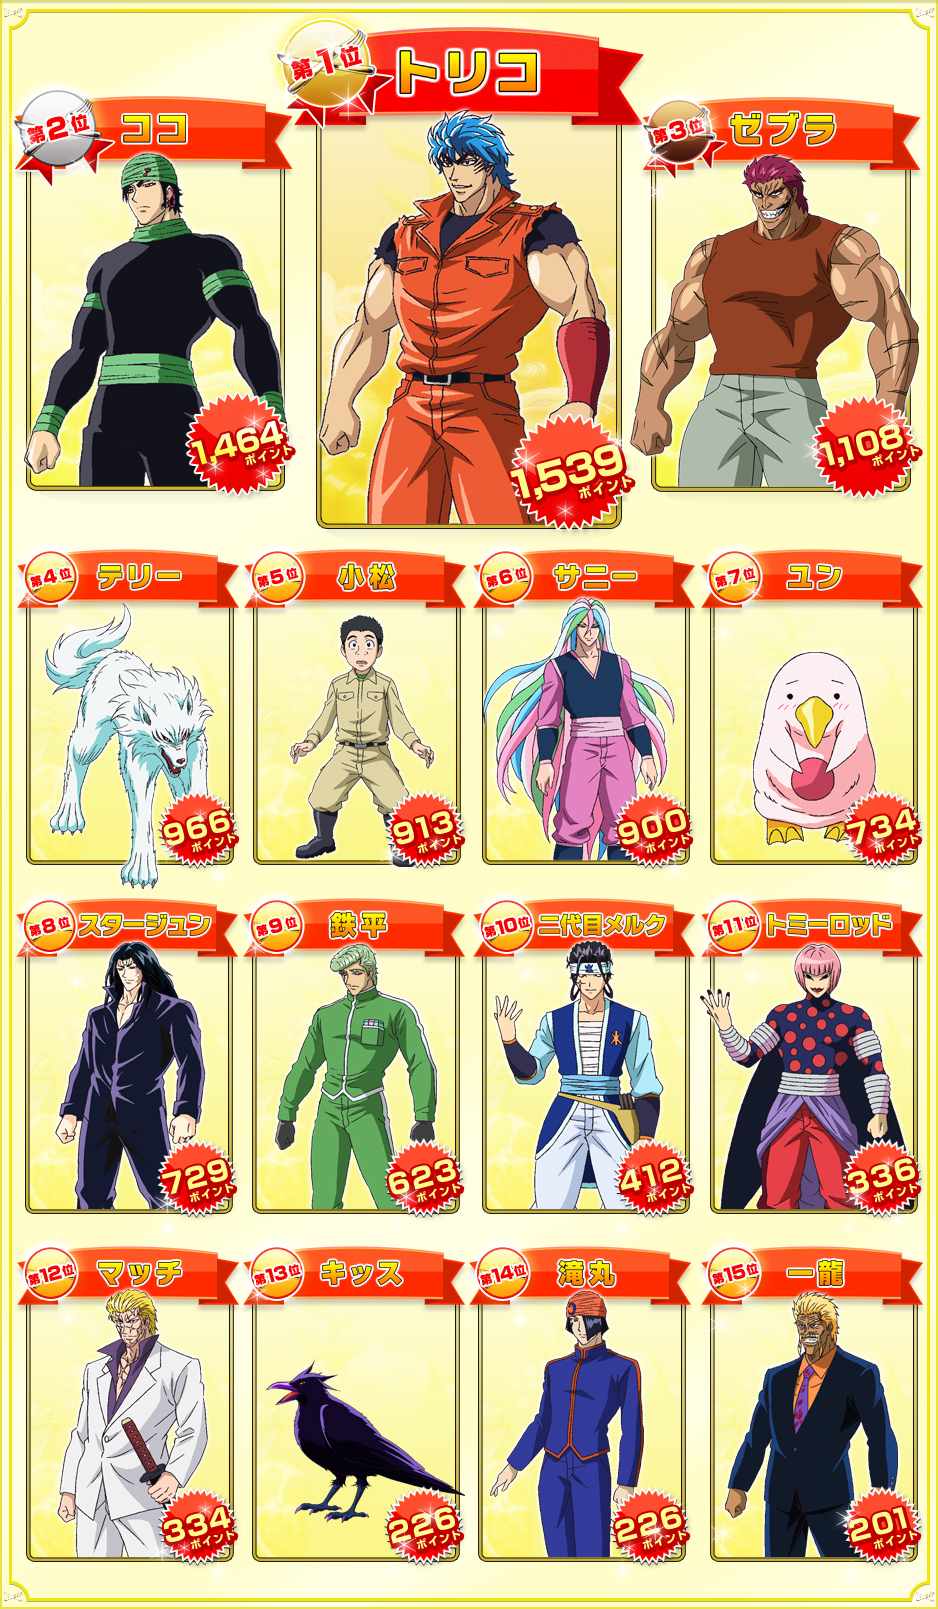 Free Anime Character Popularity Poll : Popularity poll toriko wiki